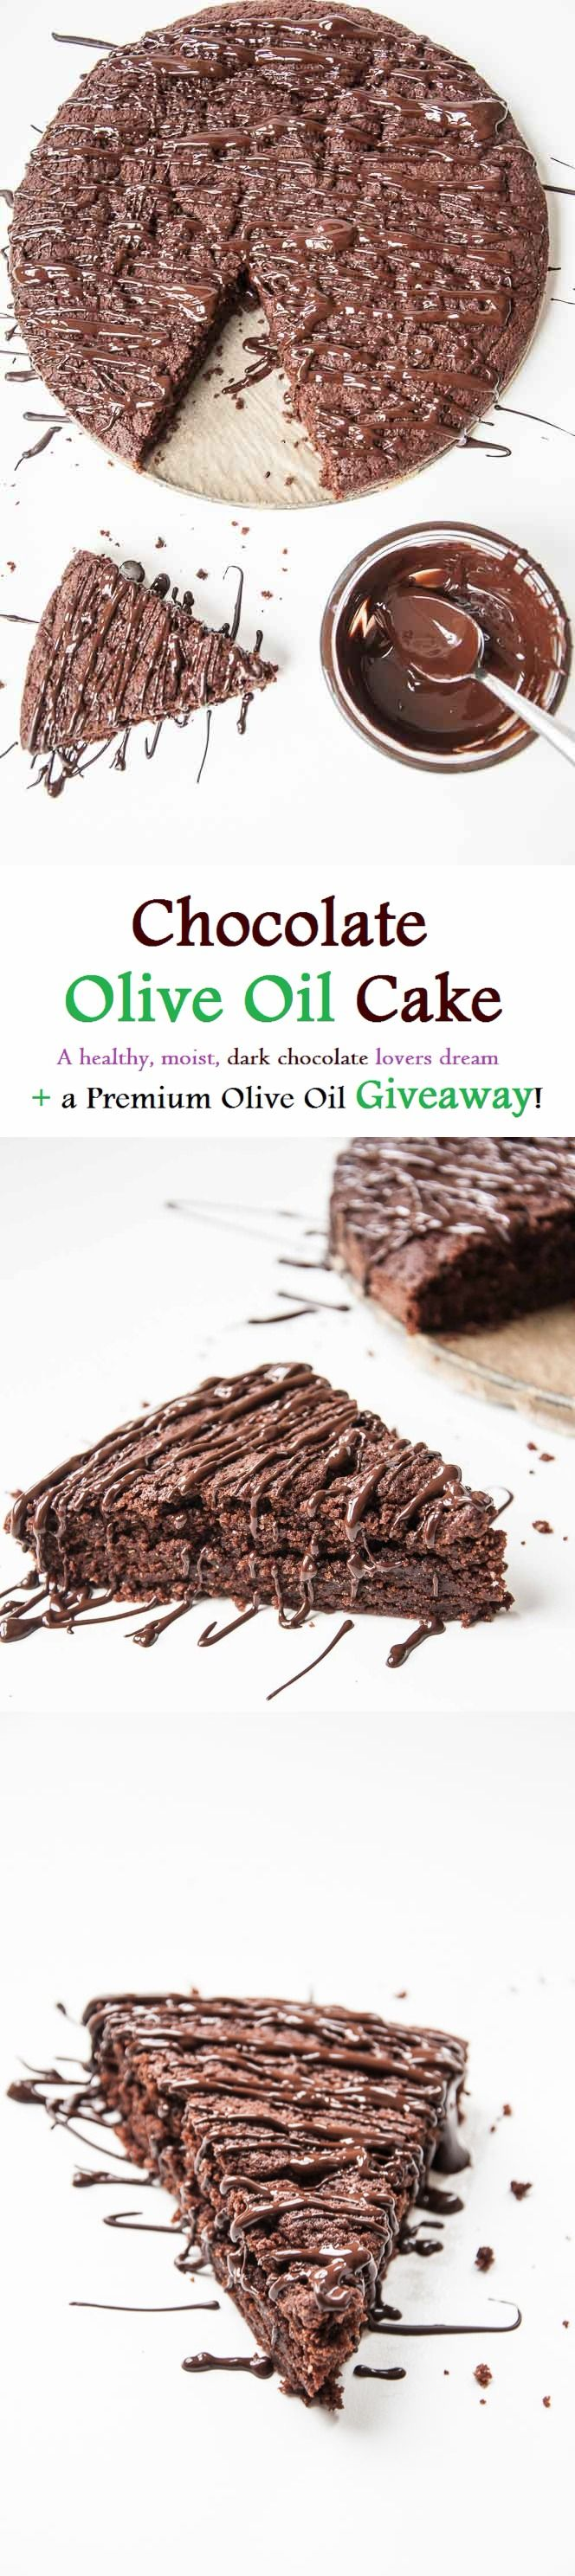 Moist Chocolate Olive Oil Cake Recipe | VeganFamilyRecipes.com | #clean eating #dessert #dark chocolate #vegan